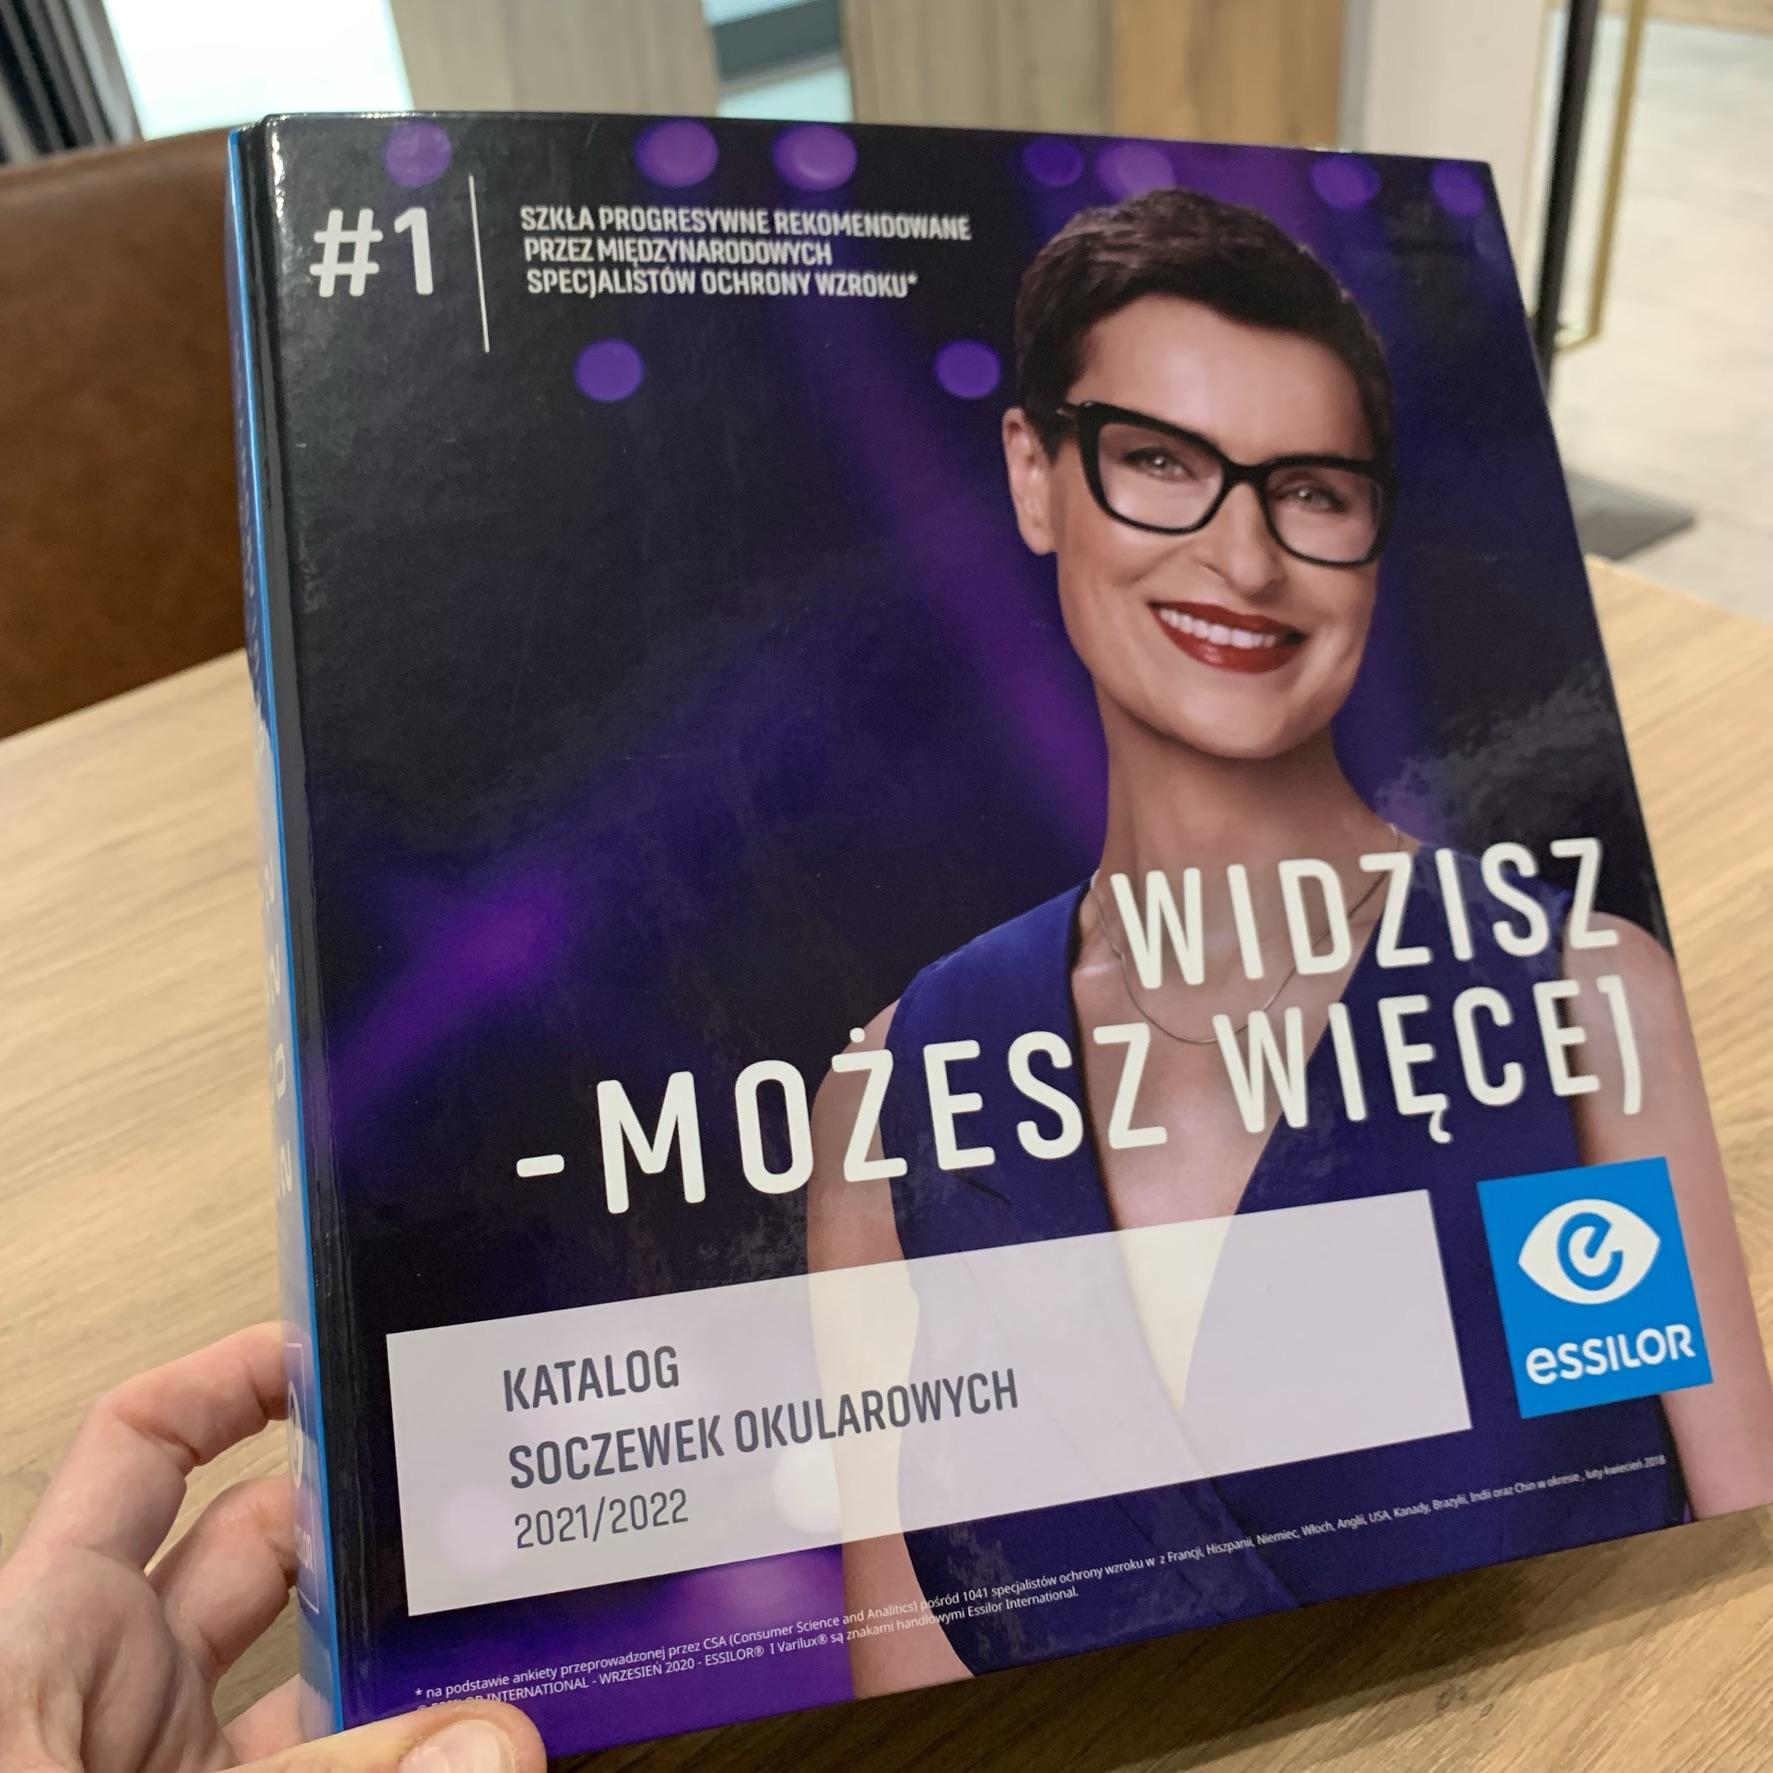 Nowy katalog Essilor